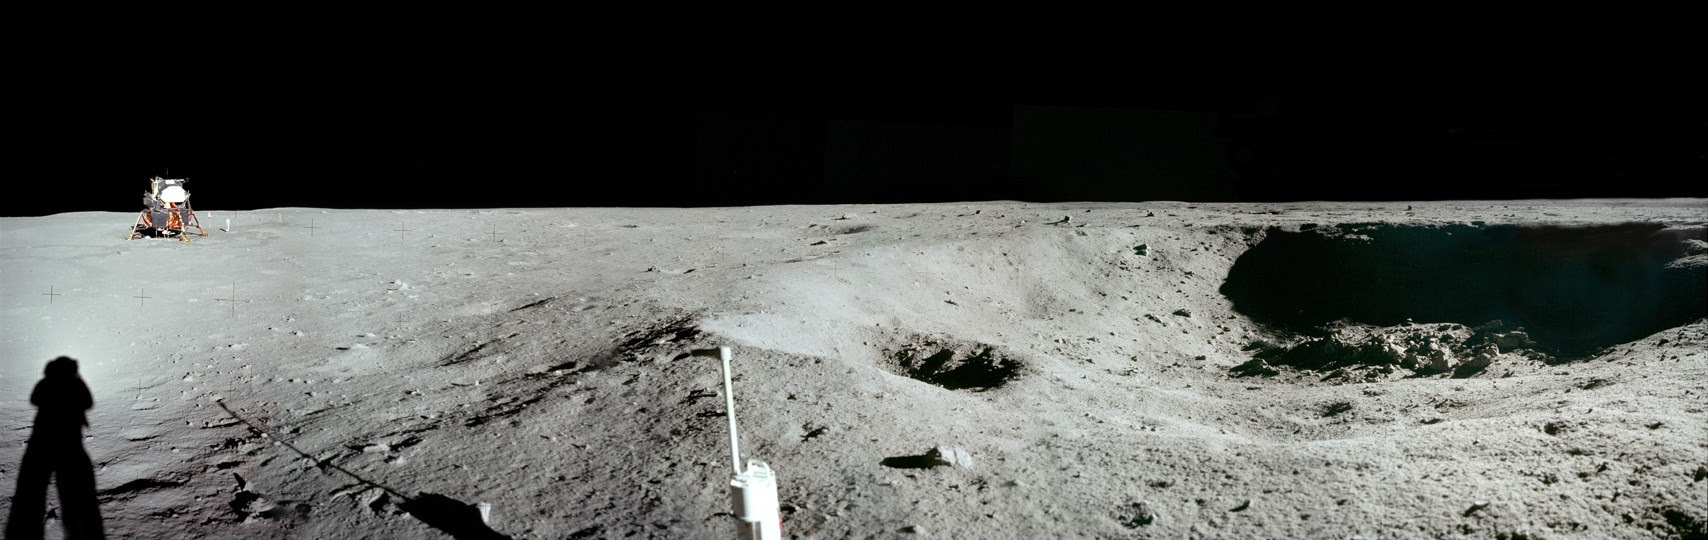 Apollo 11 East Crater